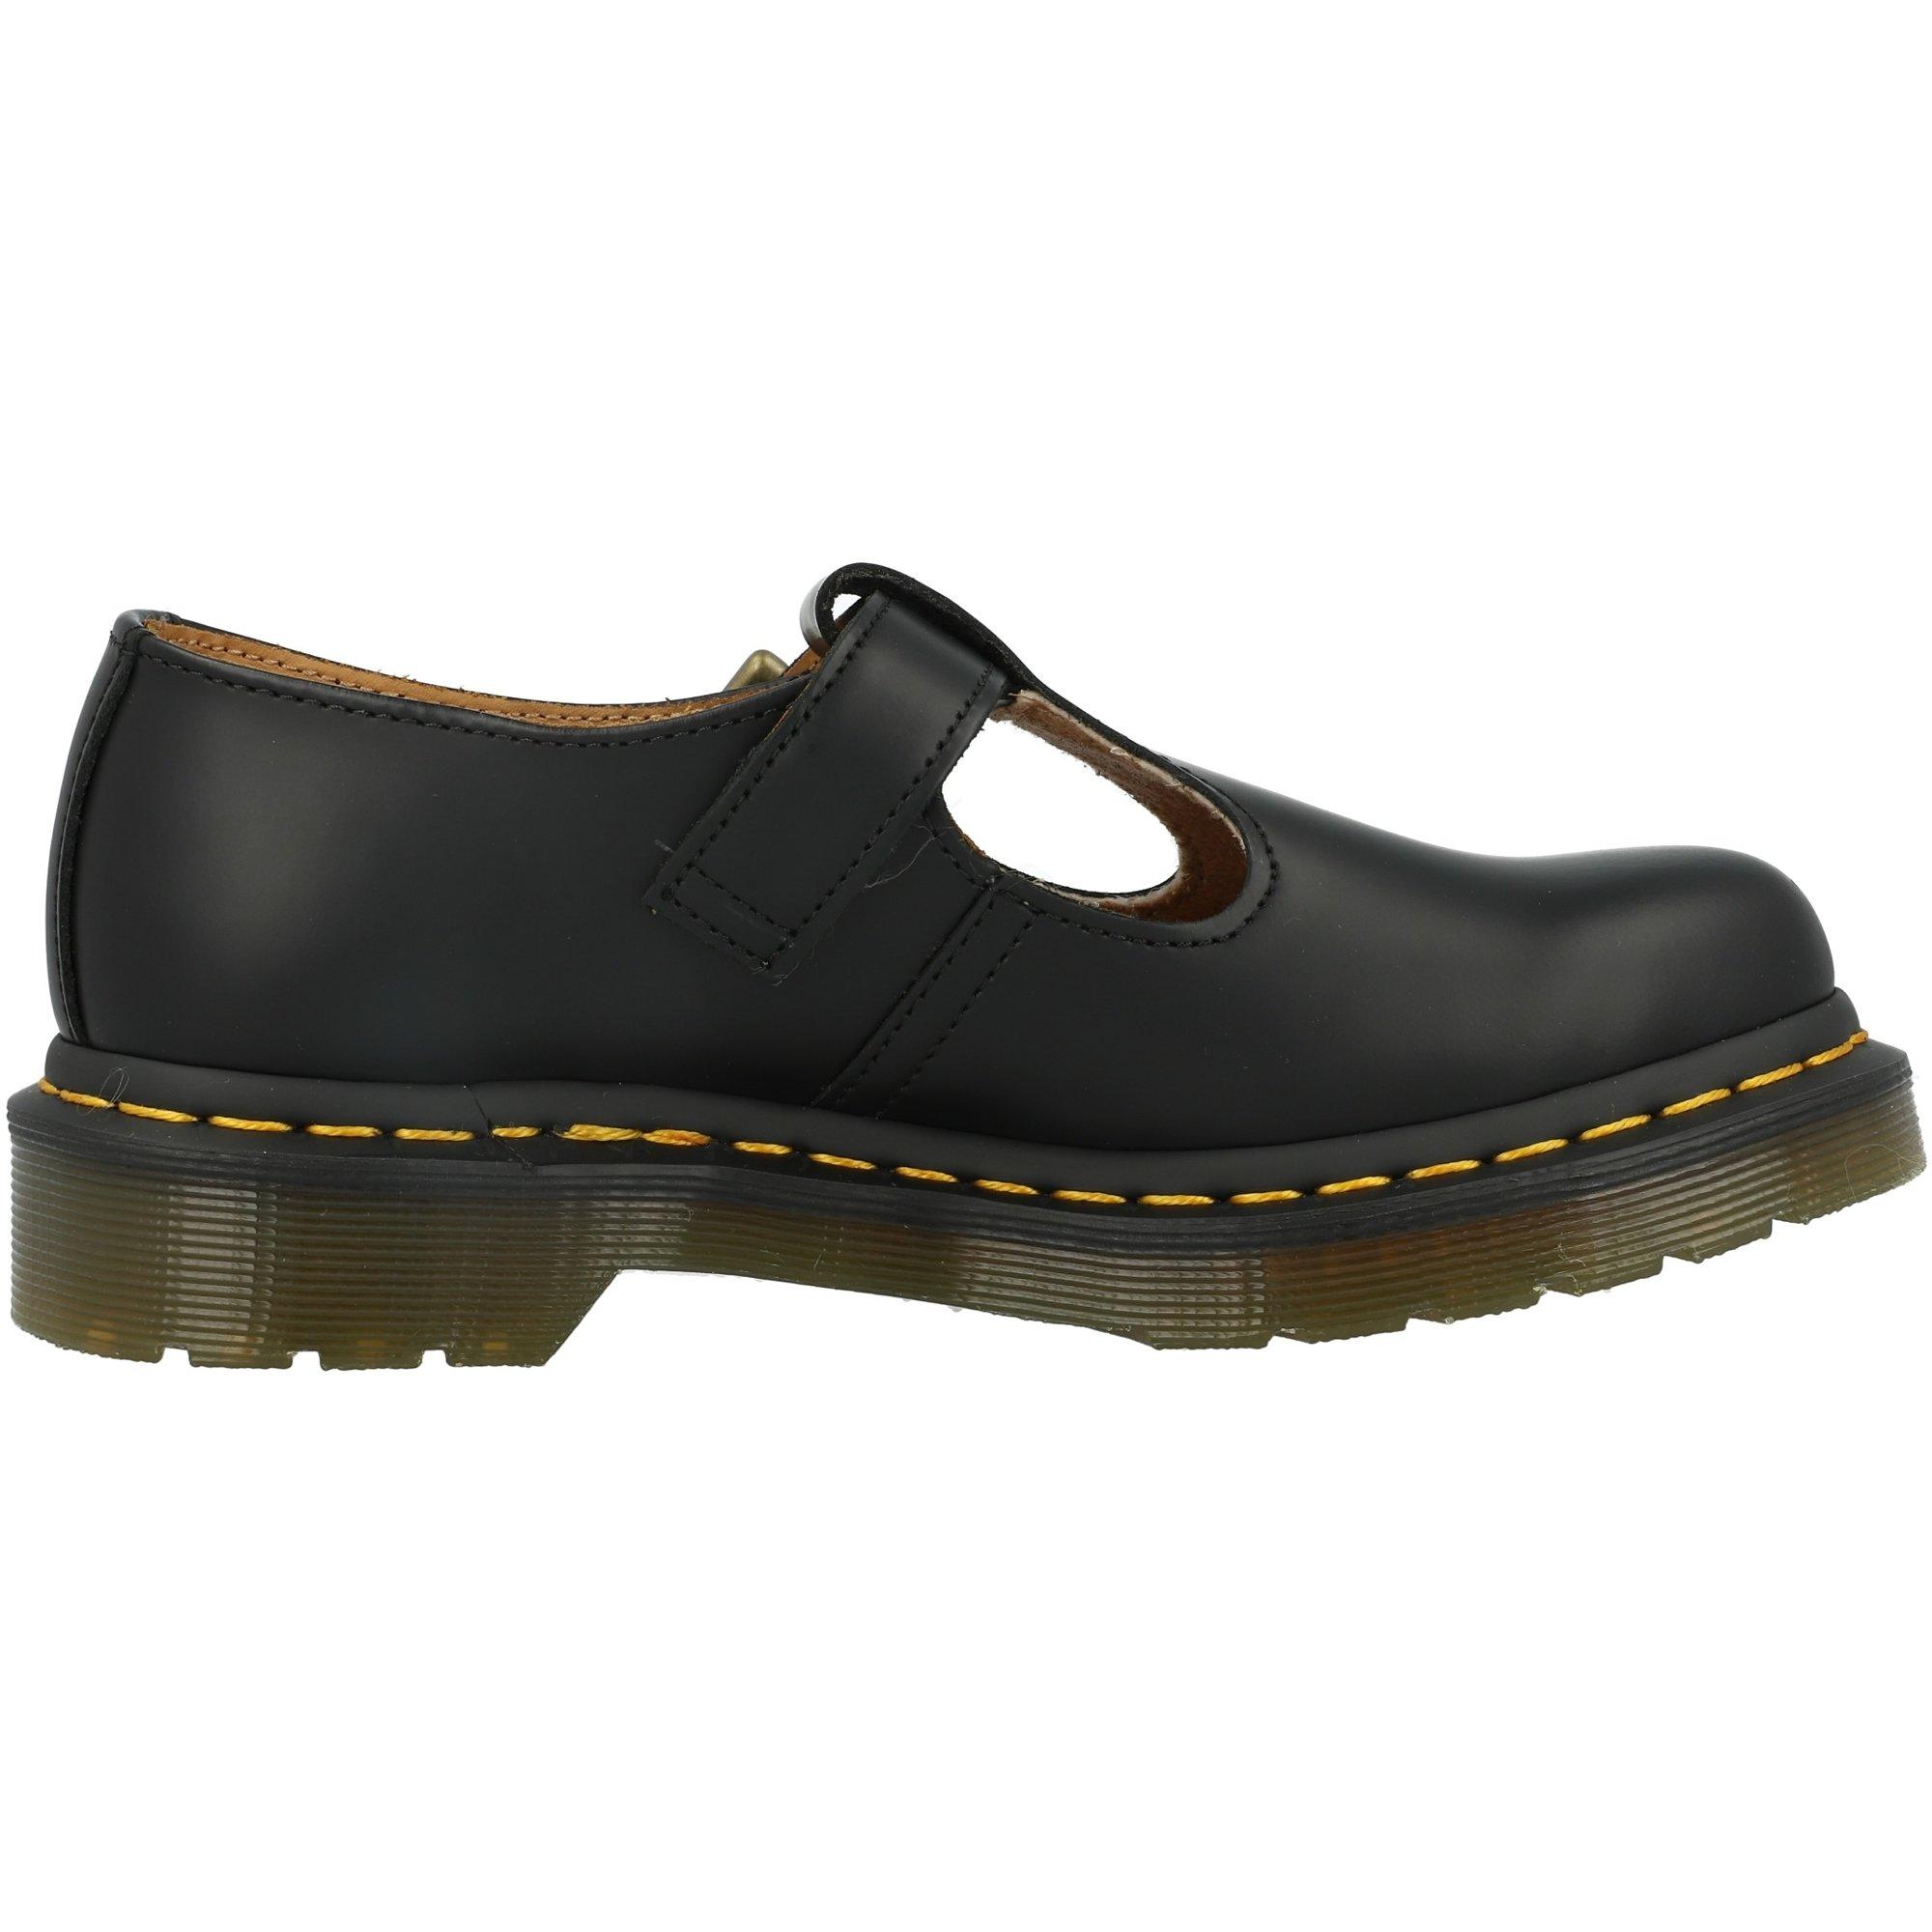 Dr Martens Polley Black Leather Adult